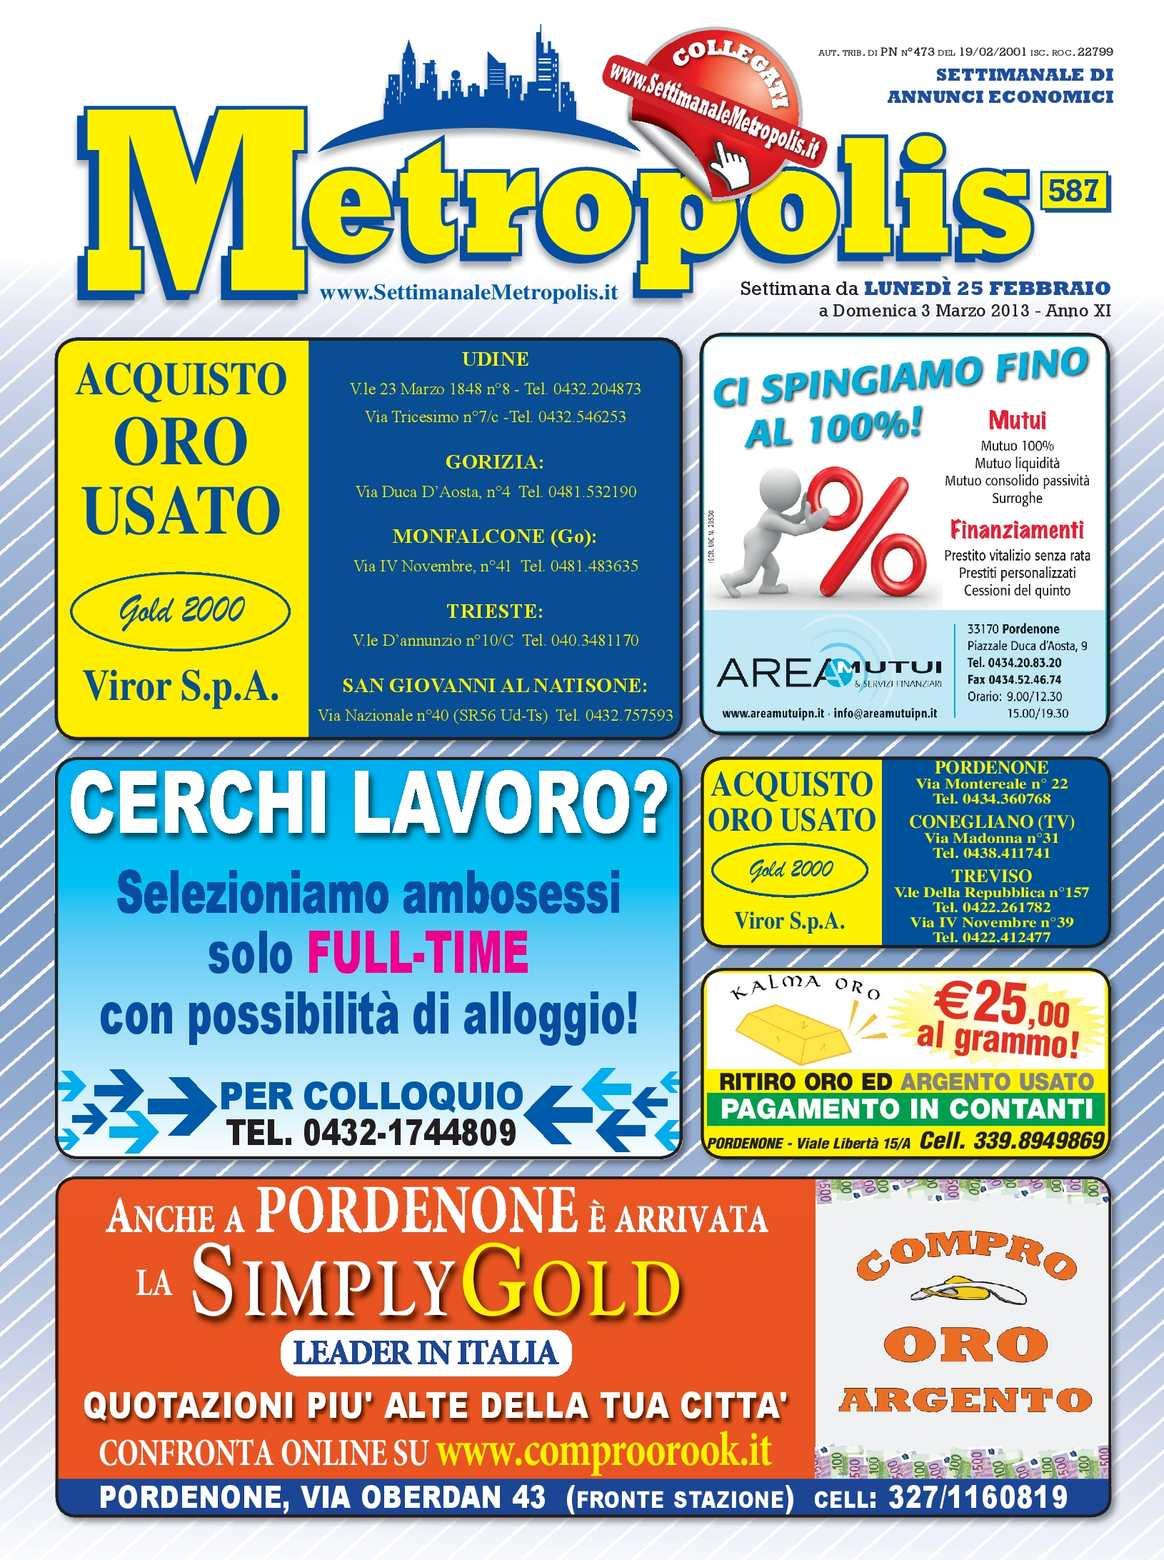 Metropolis Febbraio 2013 Del Calaméo587 25 TOZiPkXwul